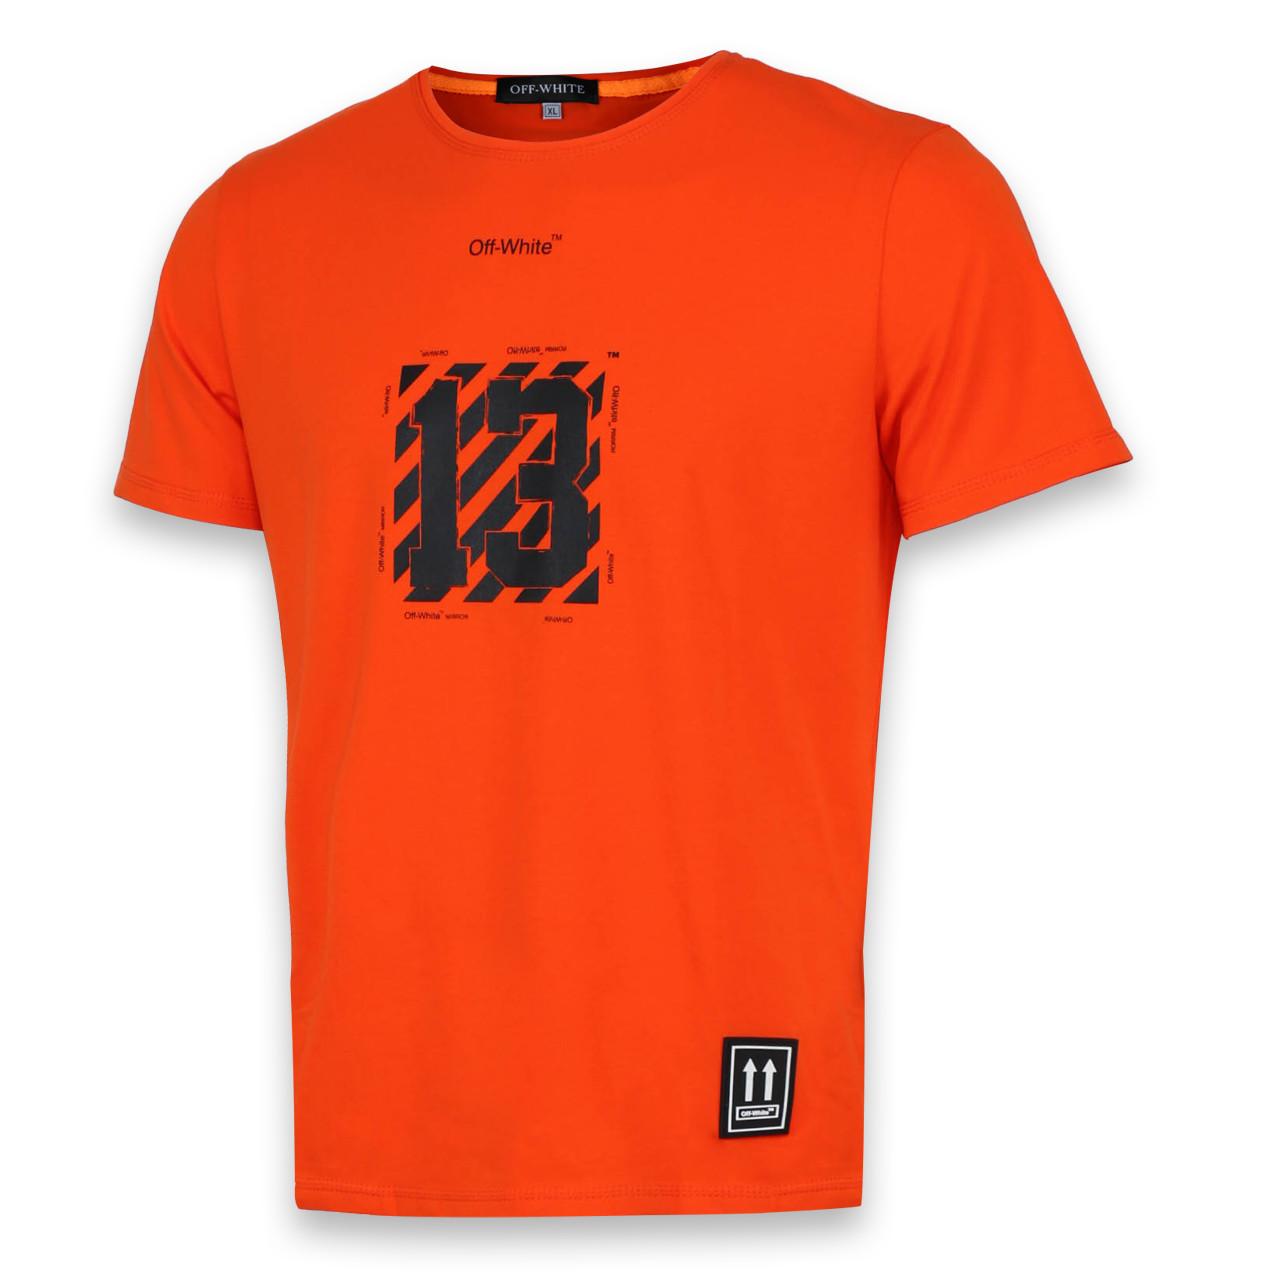 Футболка мужская оранжевая с принтом OFF-WHITE №13 Ф-10 ORN L(Р) 19-651-020-001